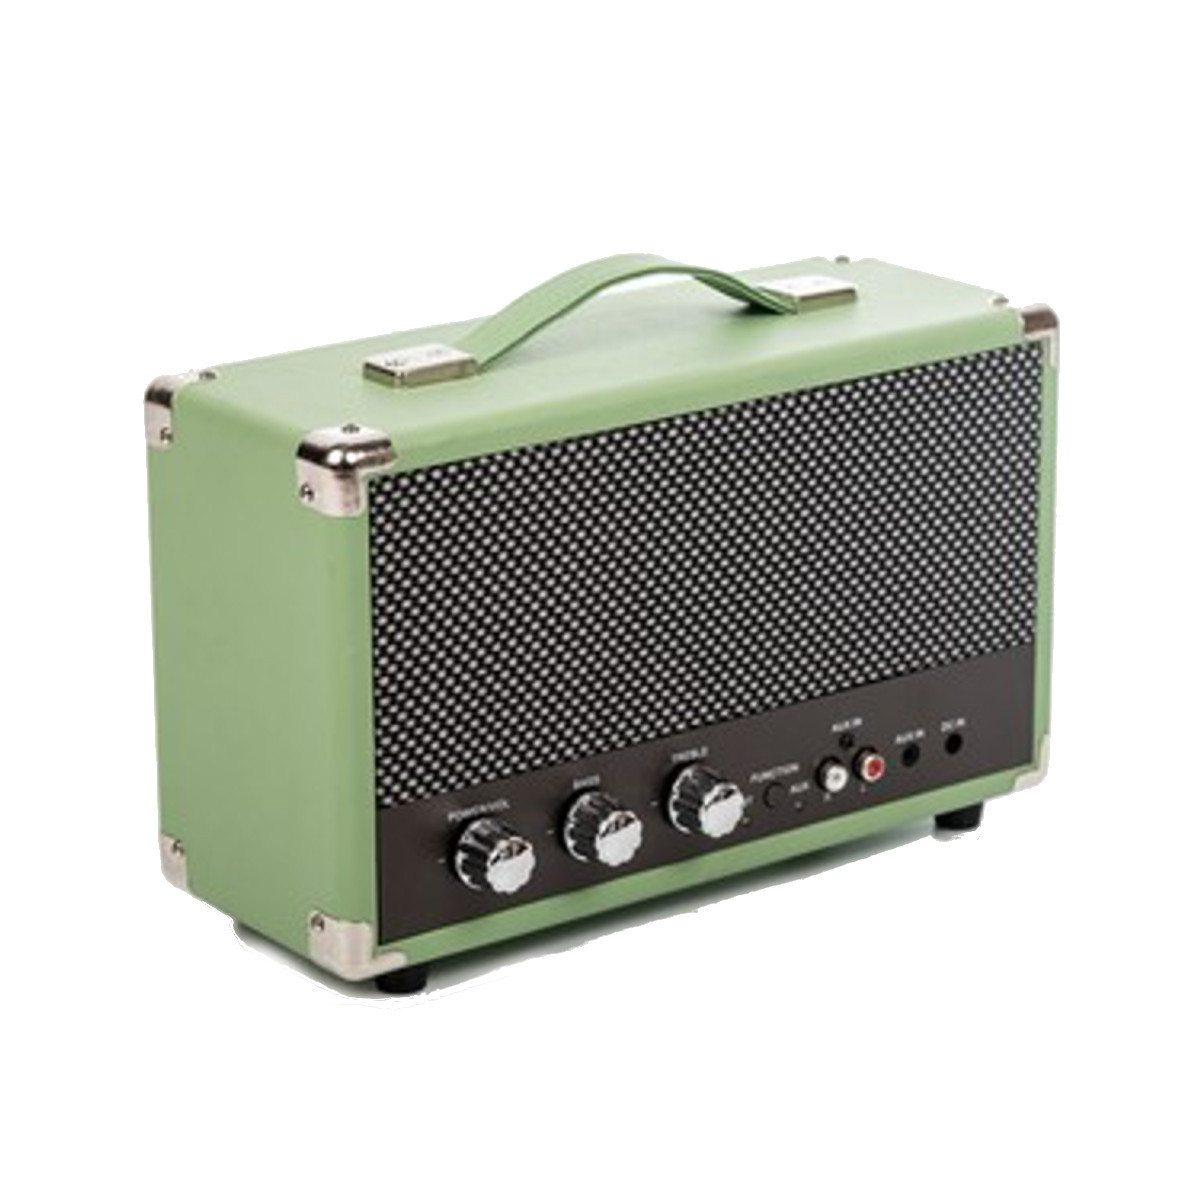 GPO Compact Bluetooth Lautsprecher Grün